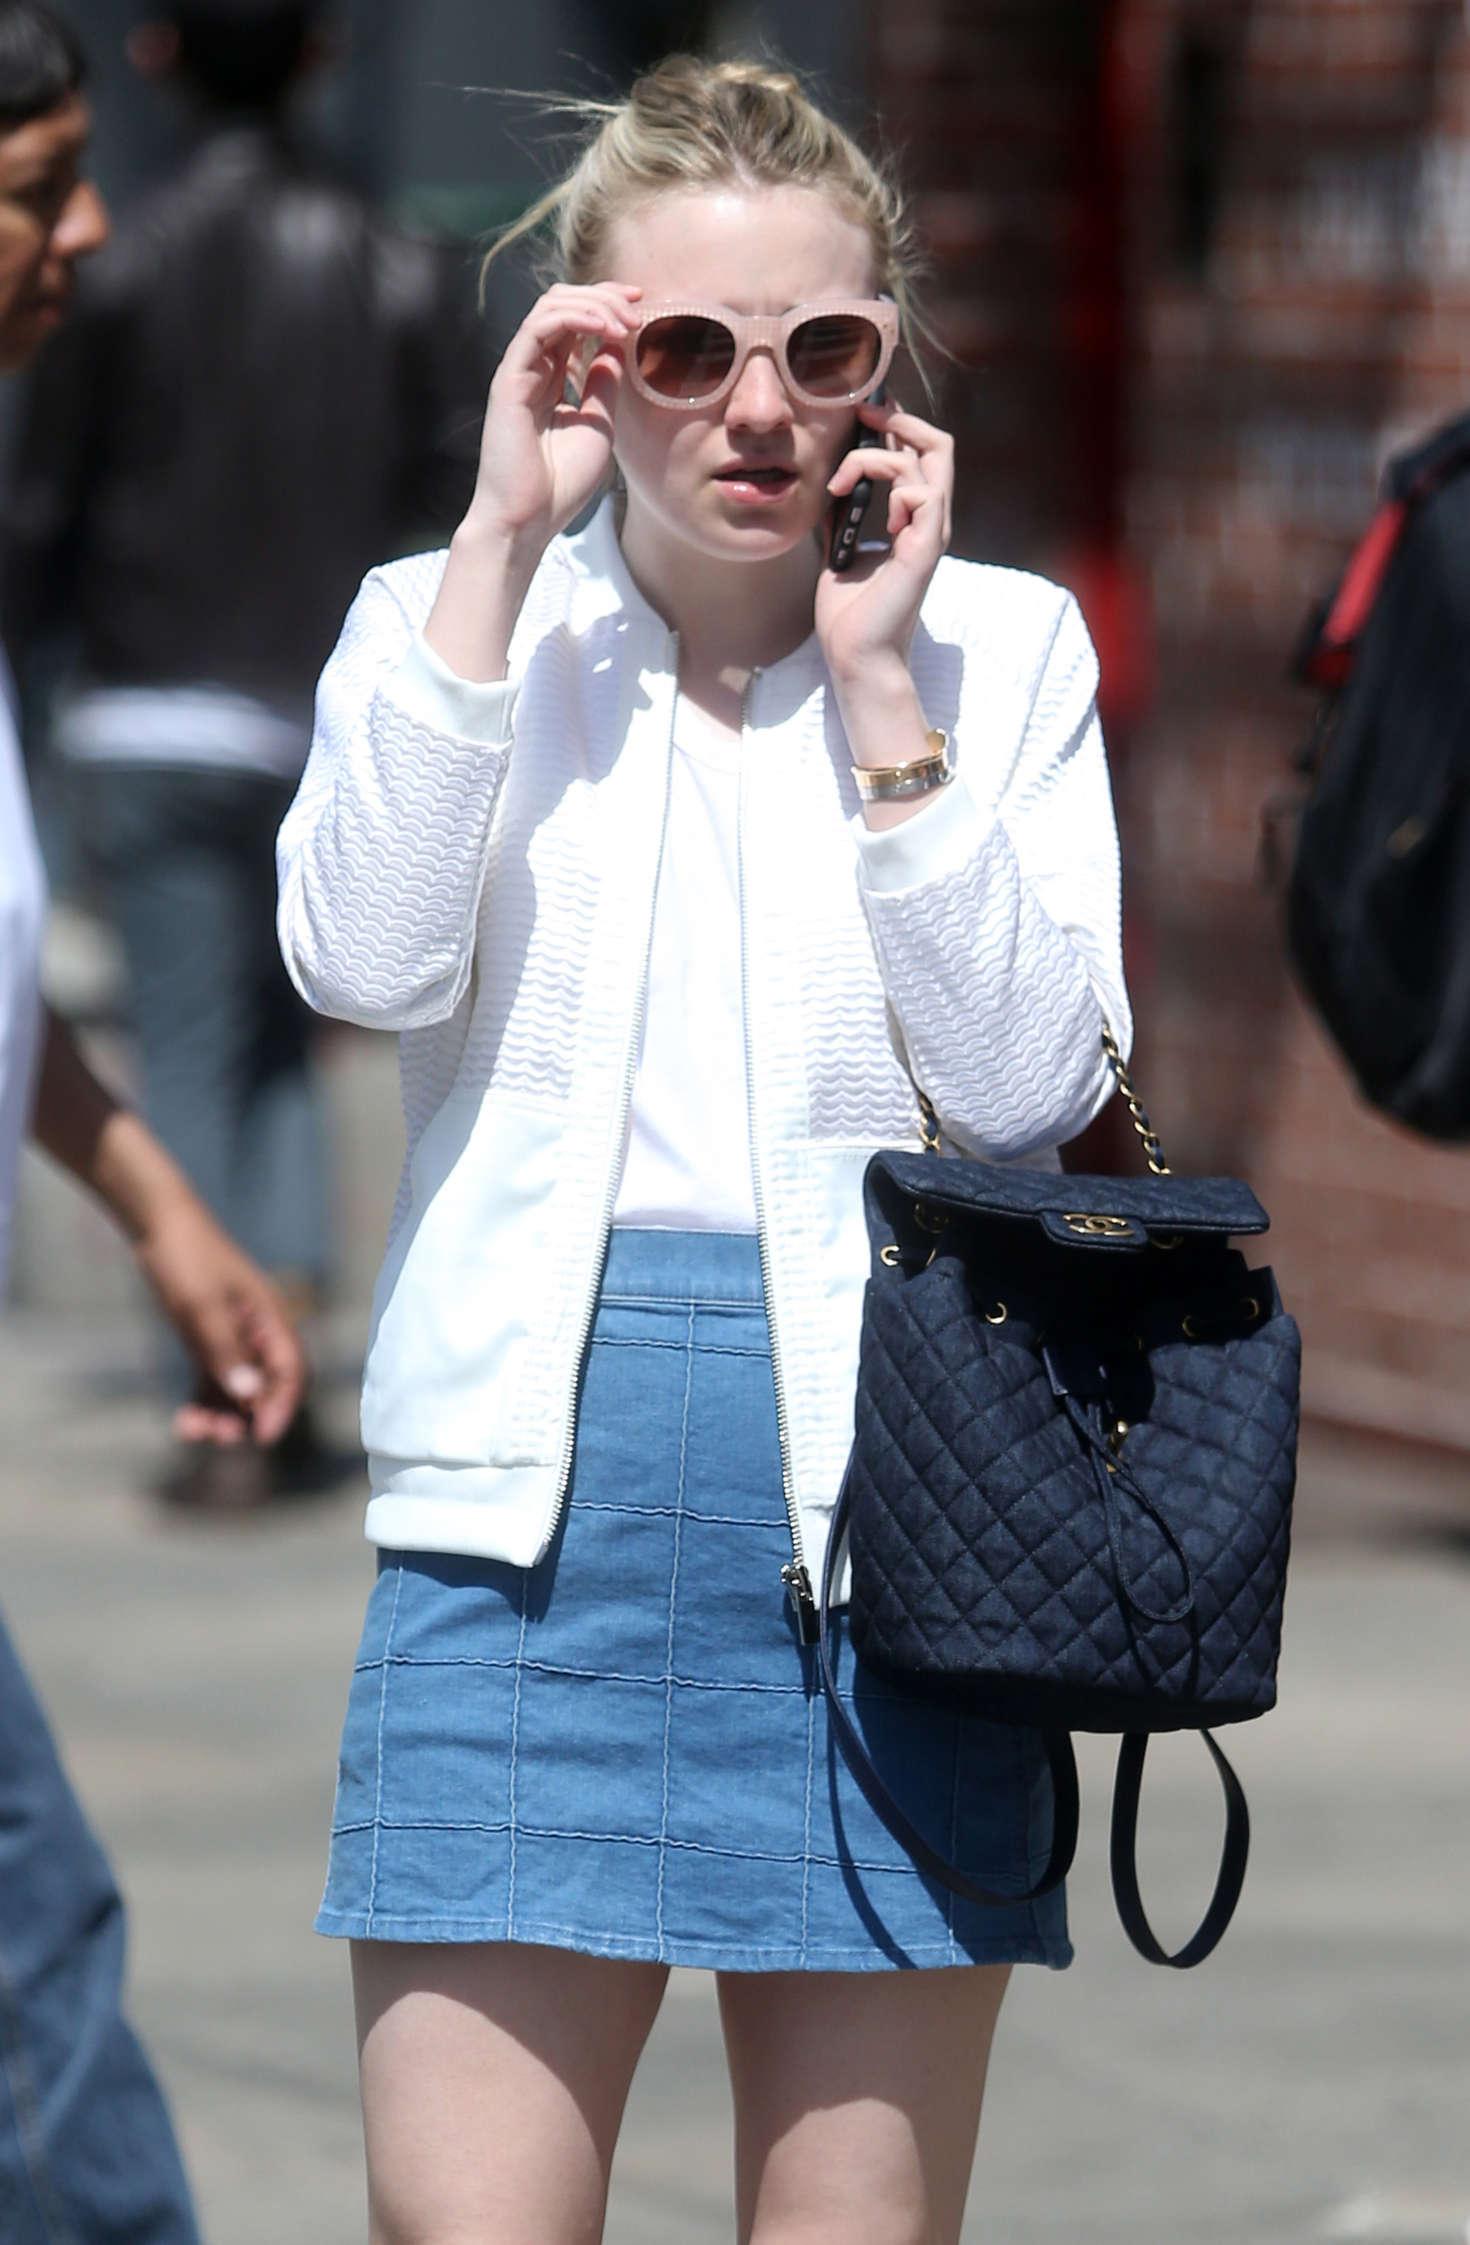 Dakota Fanning in Jeans Skirt Out in New York City